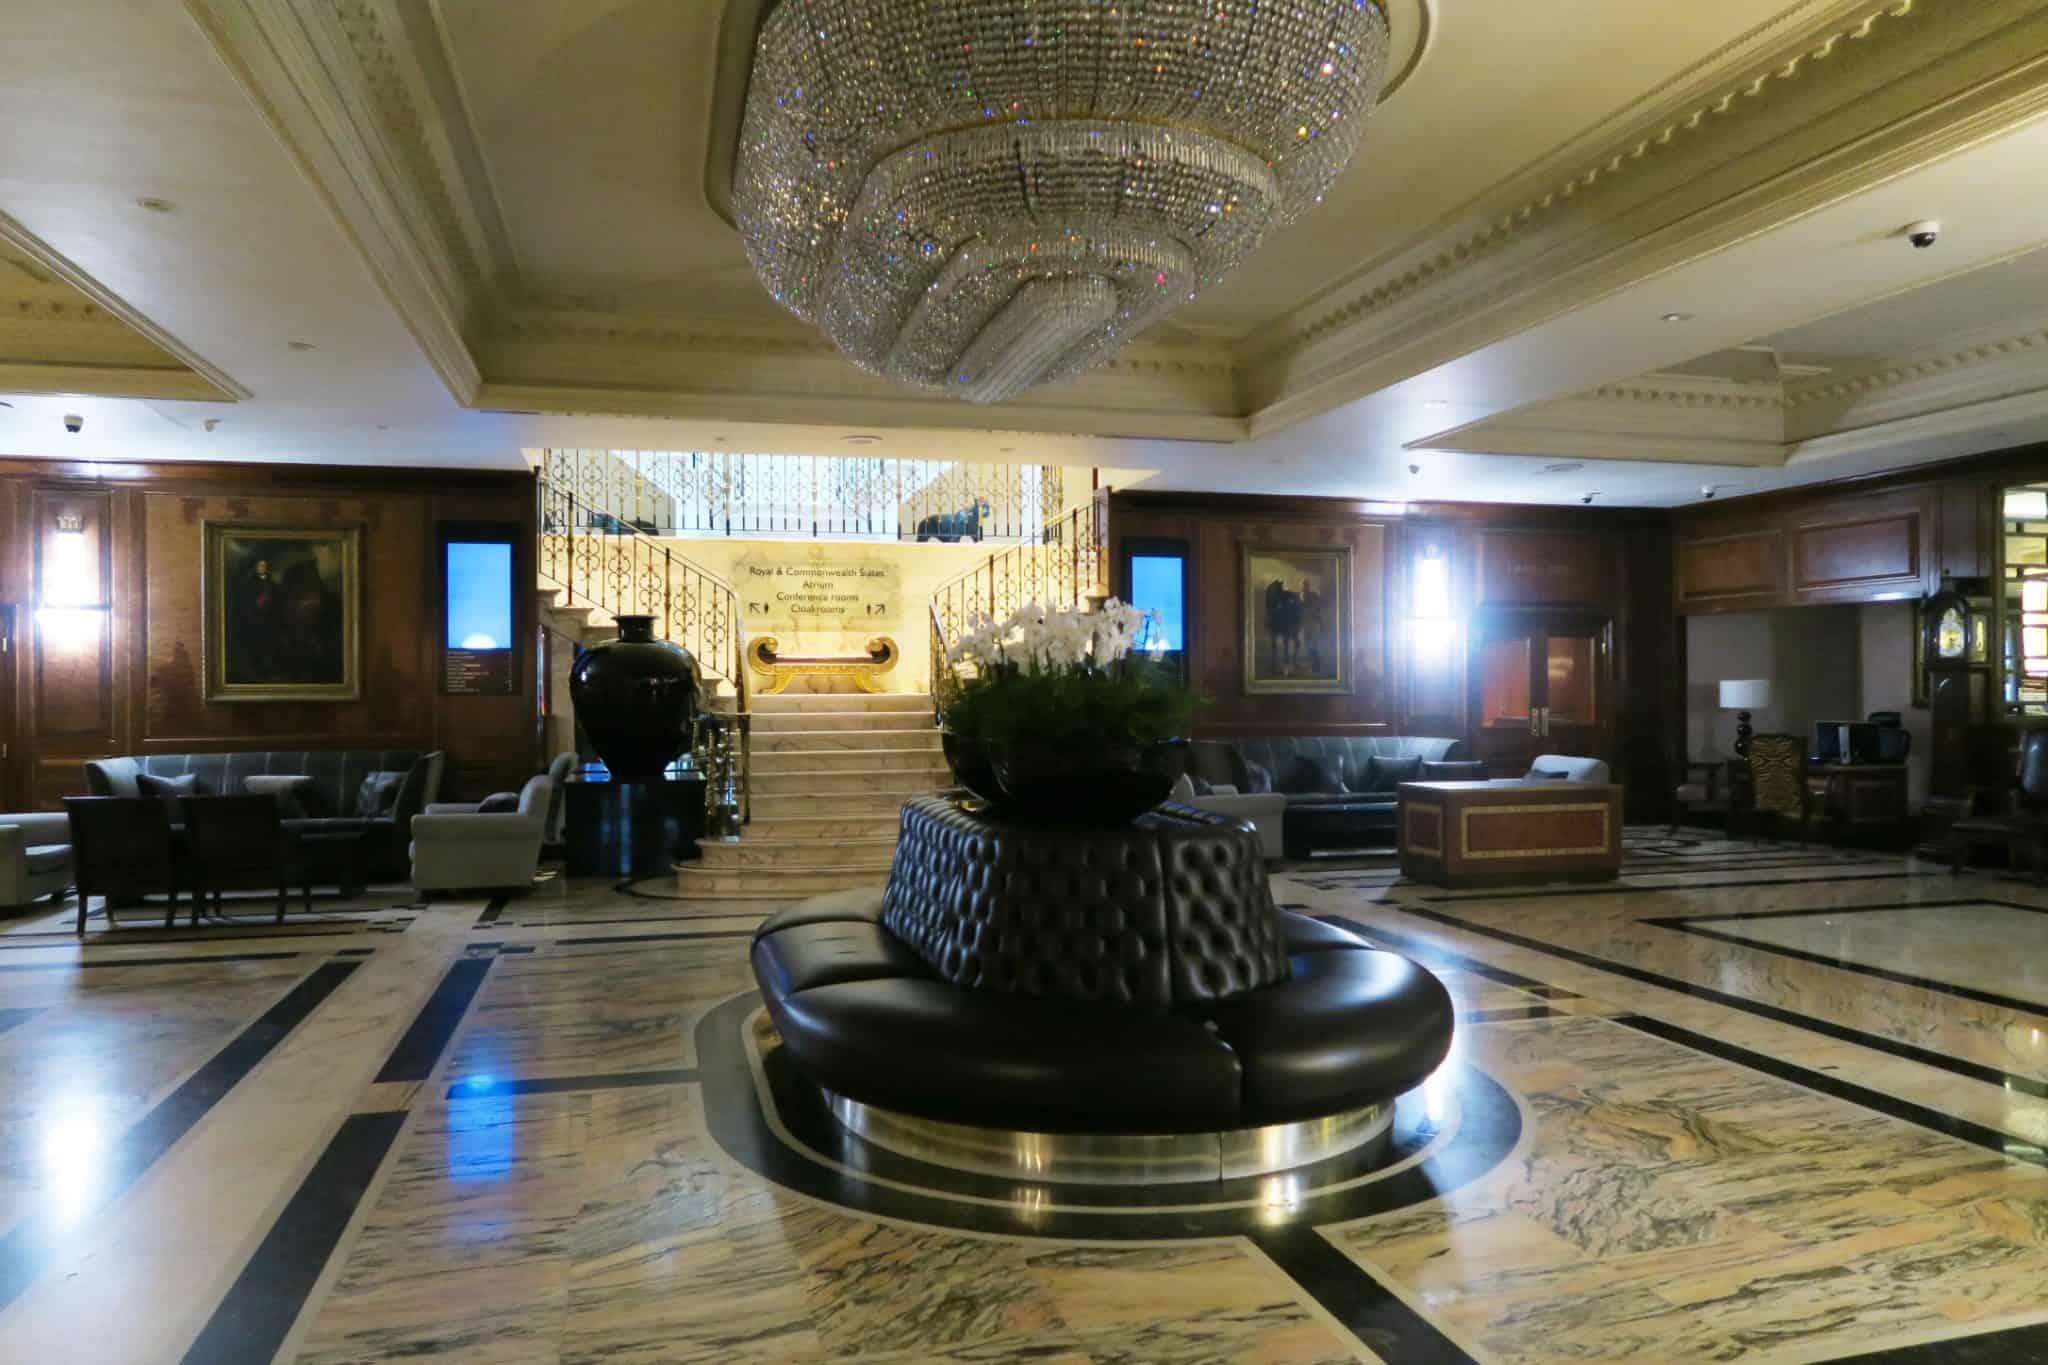 Foyer with chandelier at Raddison Blu Hotel